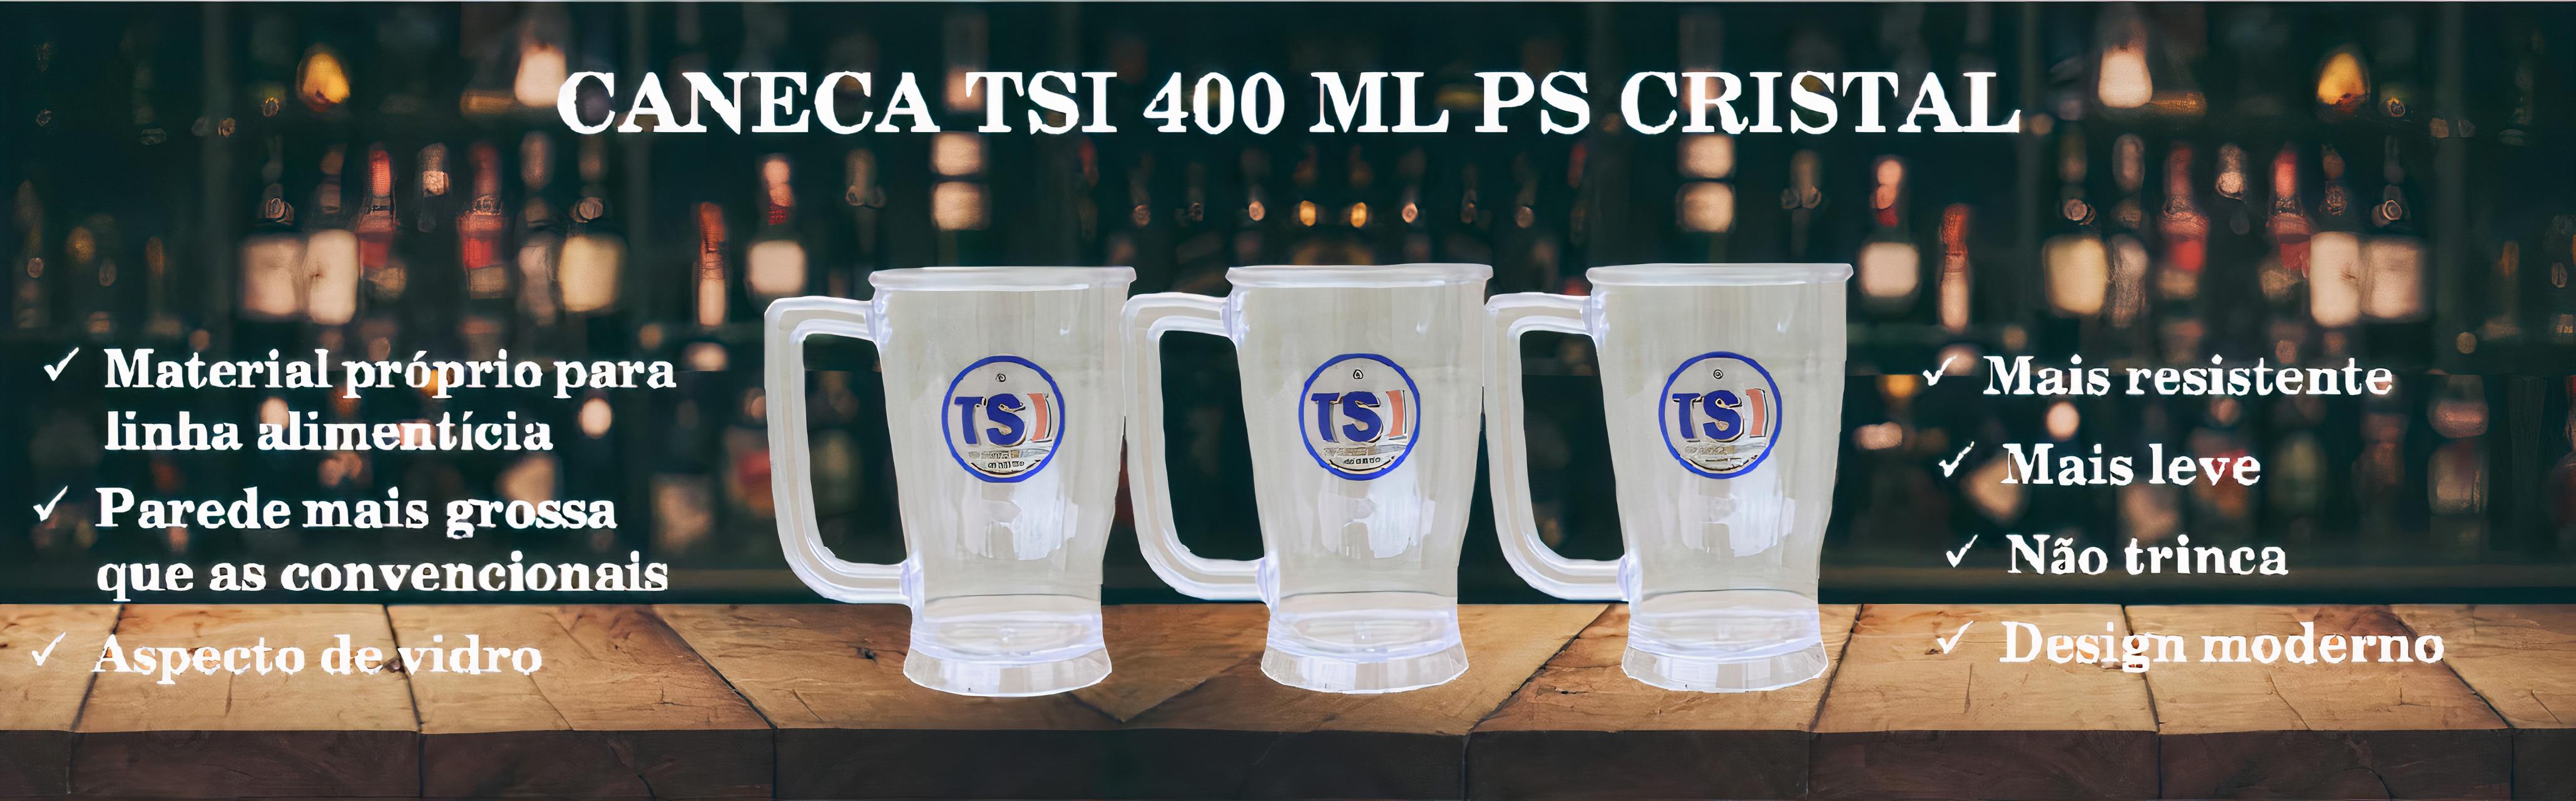 Caneca TSI 400 ml